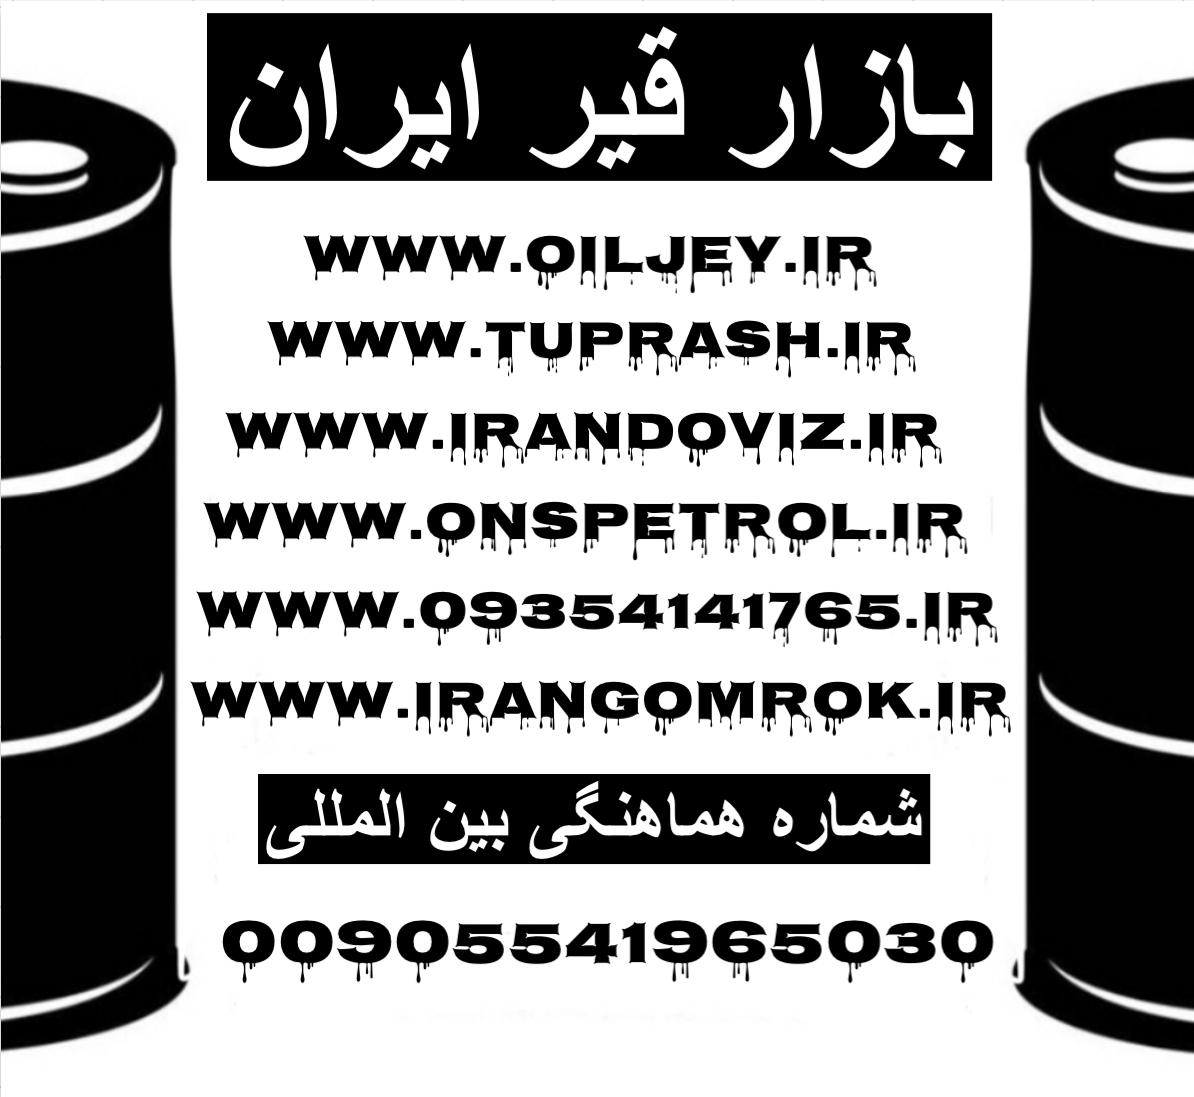 تصویر : http://rozup.ir/view/2923411/ABD83693-5564-4FAB-8FF4-93D553FBA17A.jpeg